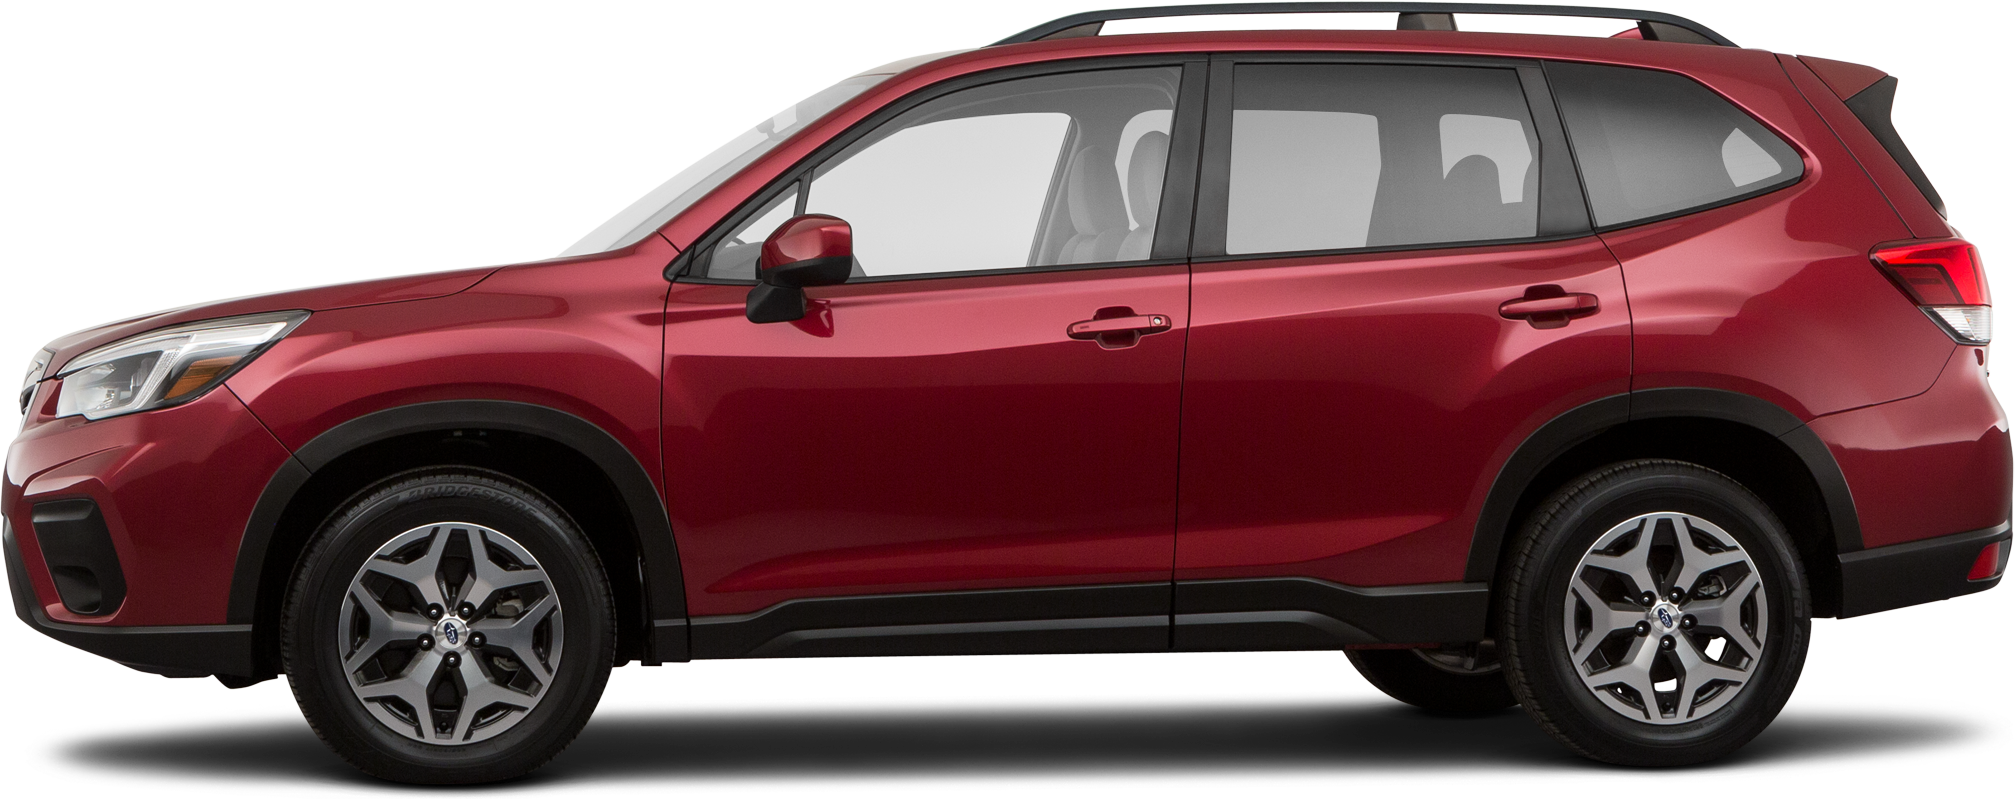 2021 Subaru Forester SUV Premium